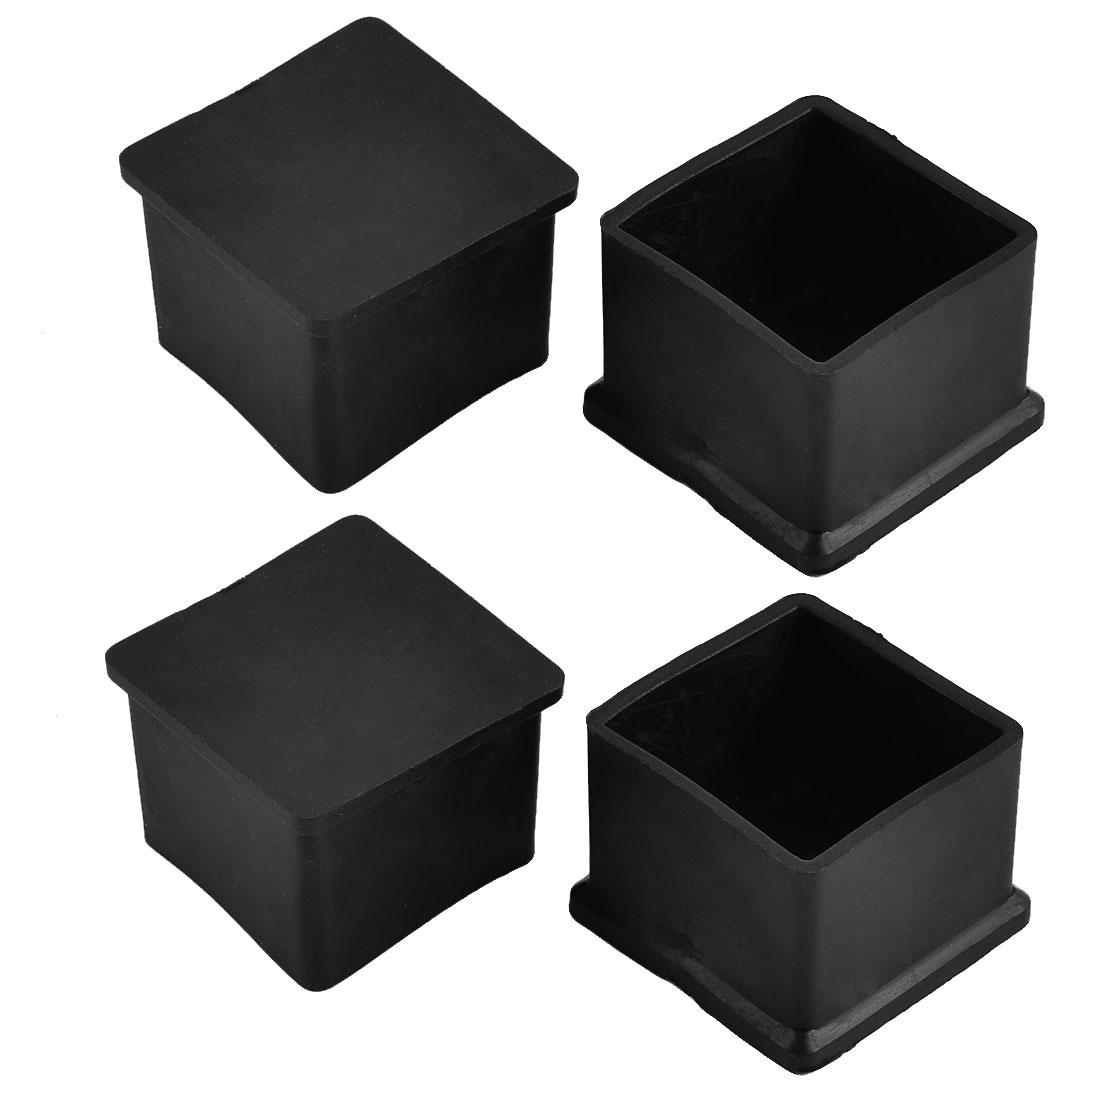 38mm x 38mm Square Shaped Home Furniture Foot Leg Rubber End Cap Cover Black 4pcs